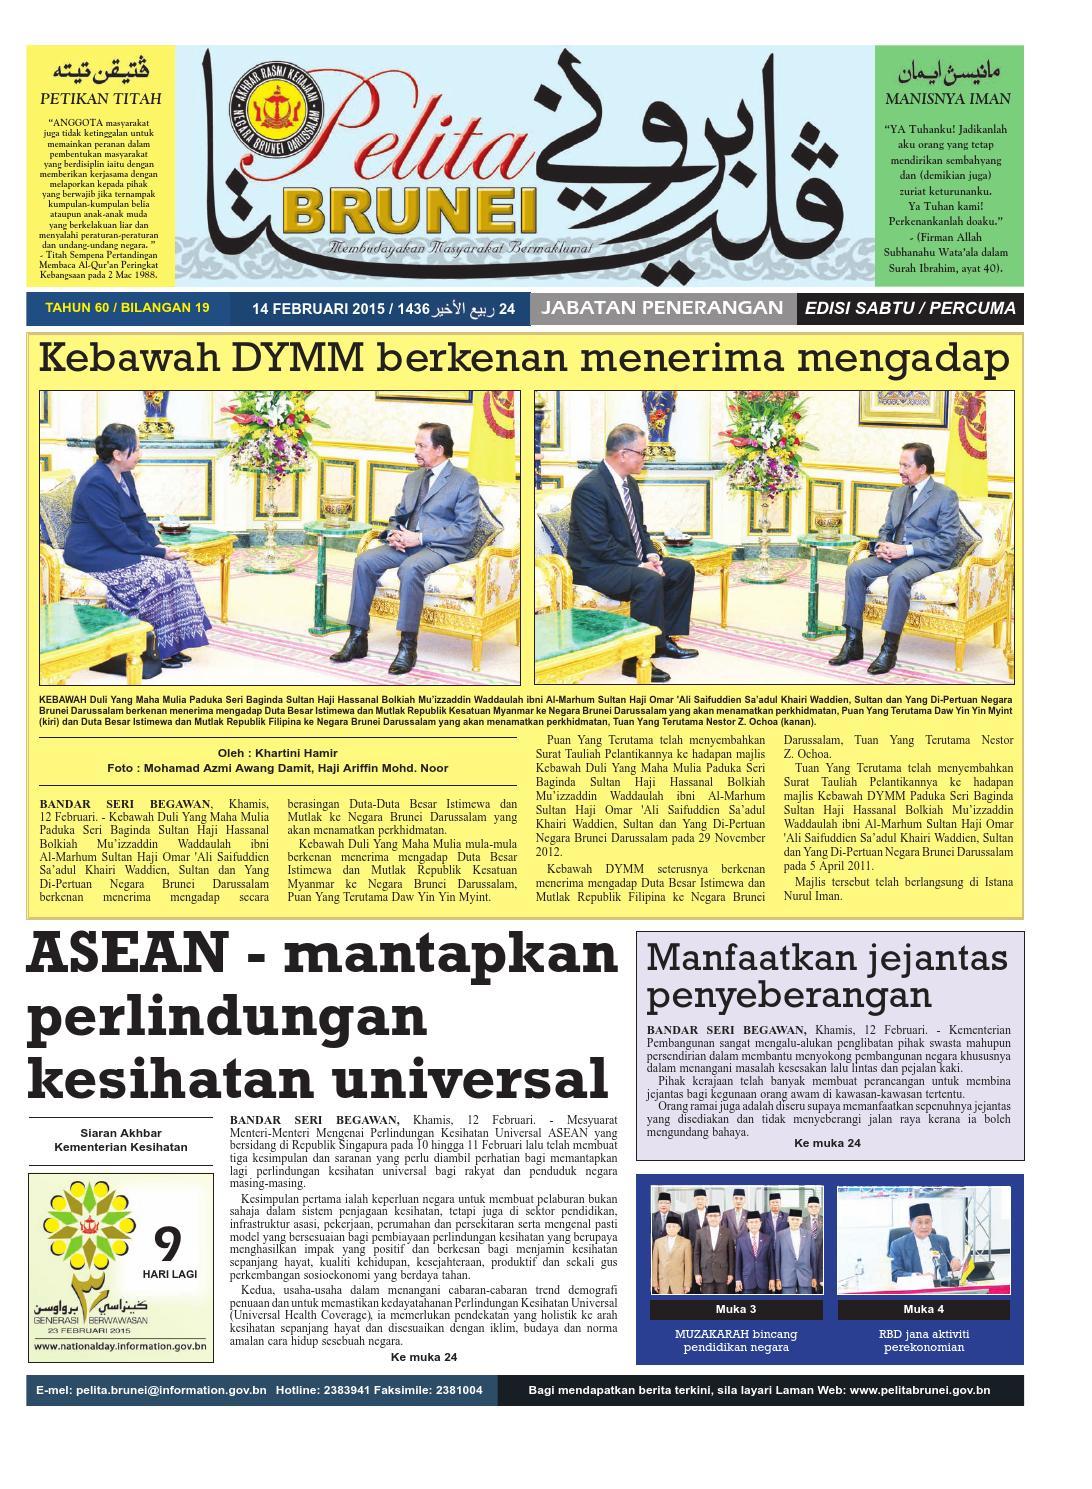 Pelita Brunei Sabtu 14 Jan 2015 By Putera Katak Brunei Issuu